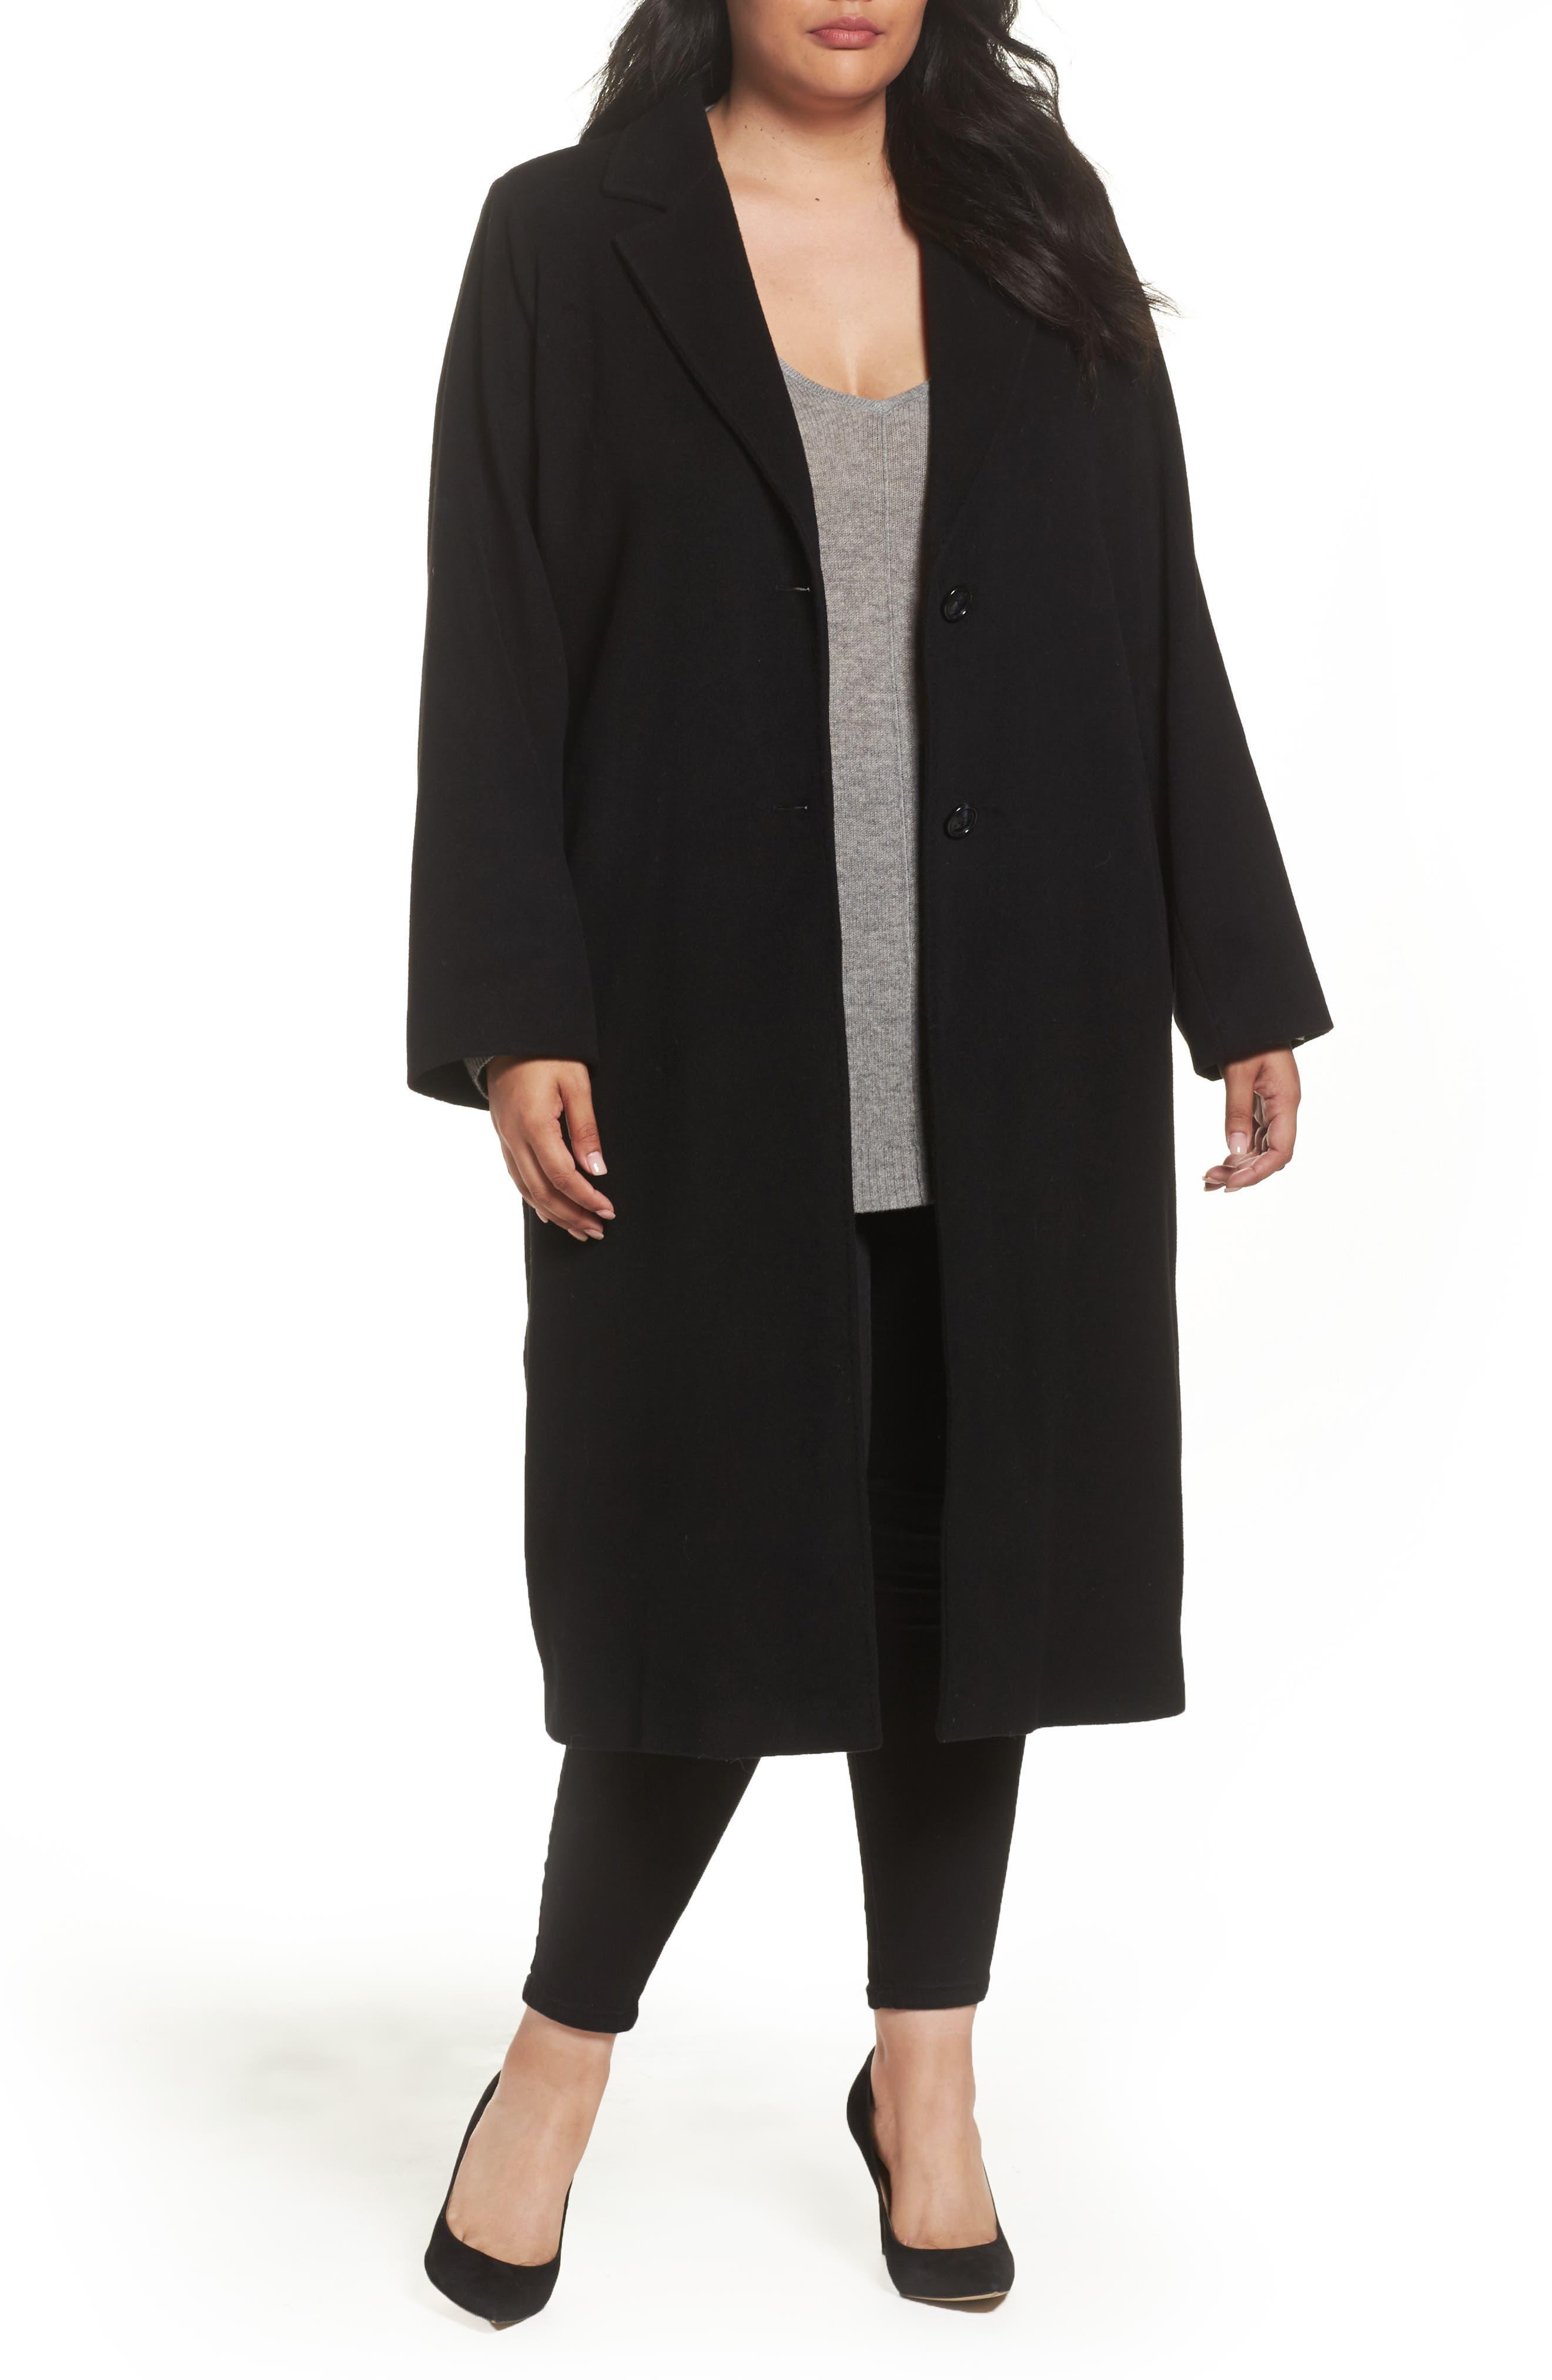 Alternate Image 1 Selected - Persona by Marina Rinaldi Tamigi Coat (Plus Size)